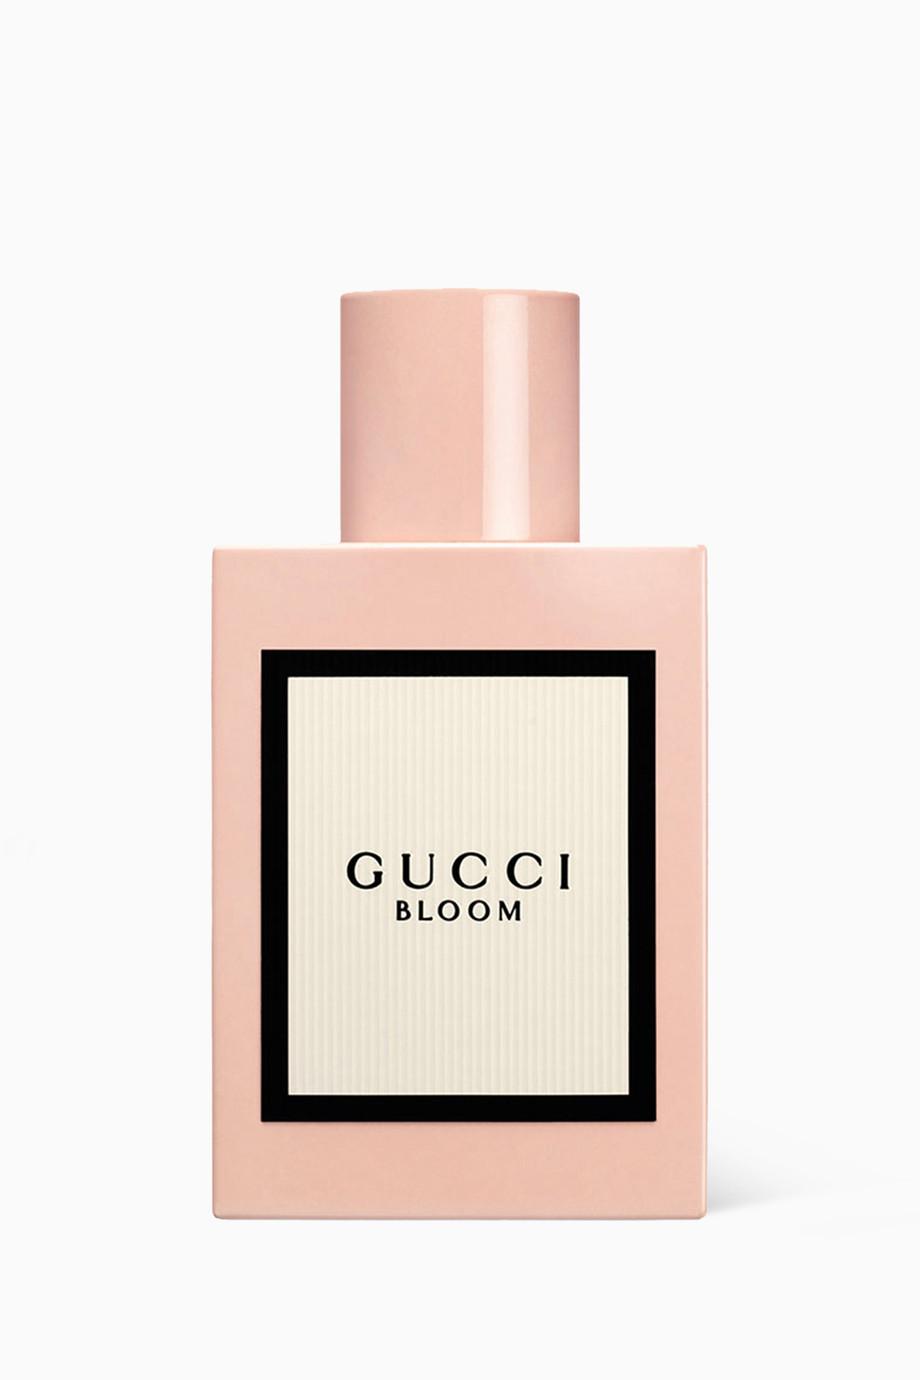 388a2e4c0 تسوق ماء عطر غوتشي بلووم، 50 ملل Gucci Perfumes ملون للنساء | اُناس ...